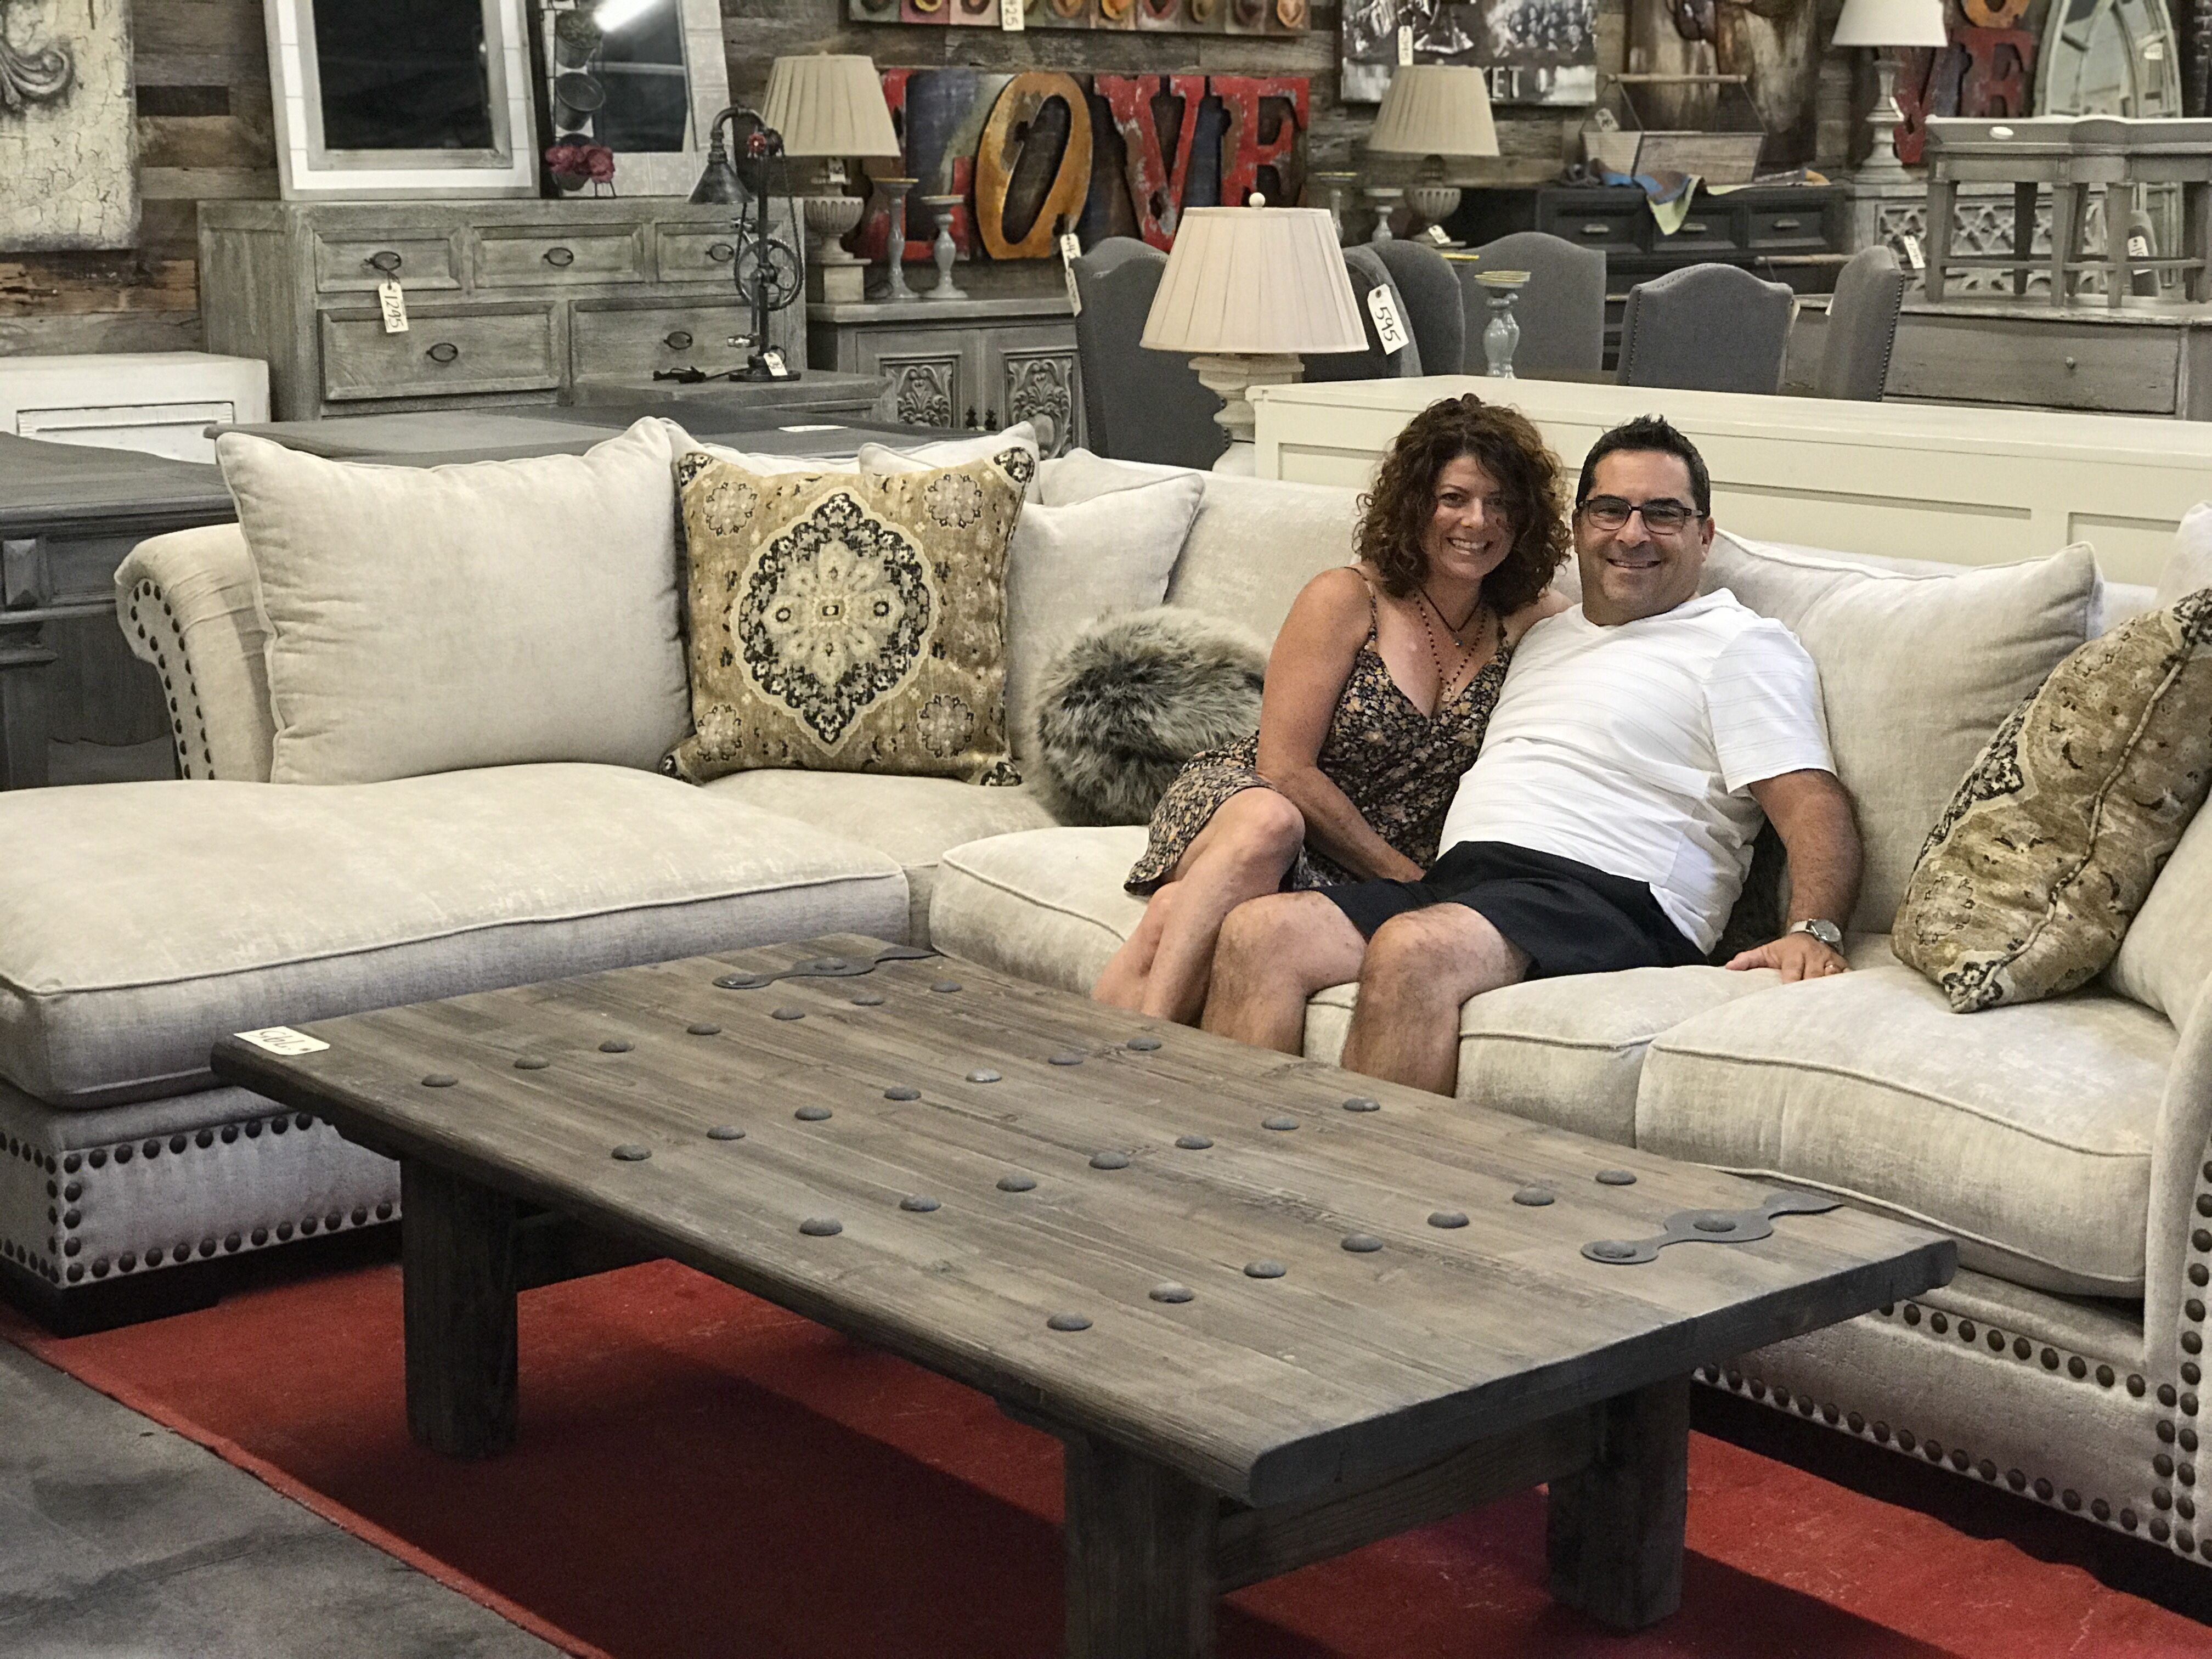 Amy And Lee Snatched Up This Custom Sofa + Chaise. A John Michael Designs  Custom Sofa. The Sofa Has Custom Gel Cushions.